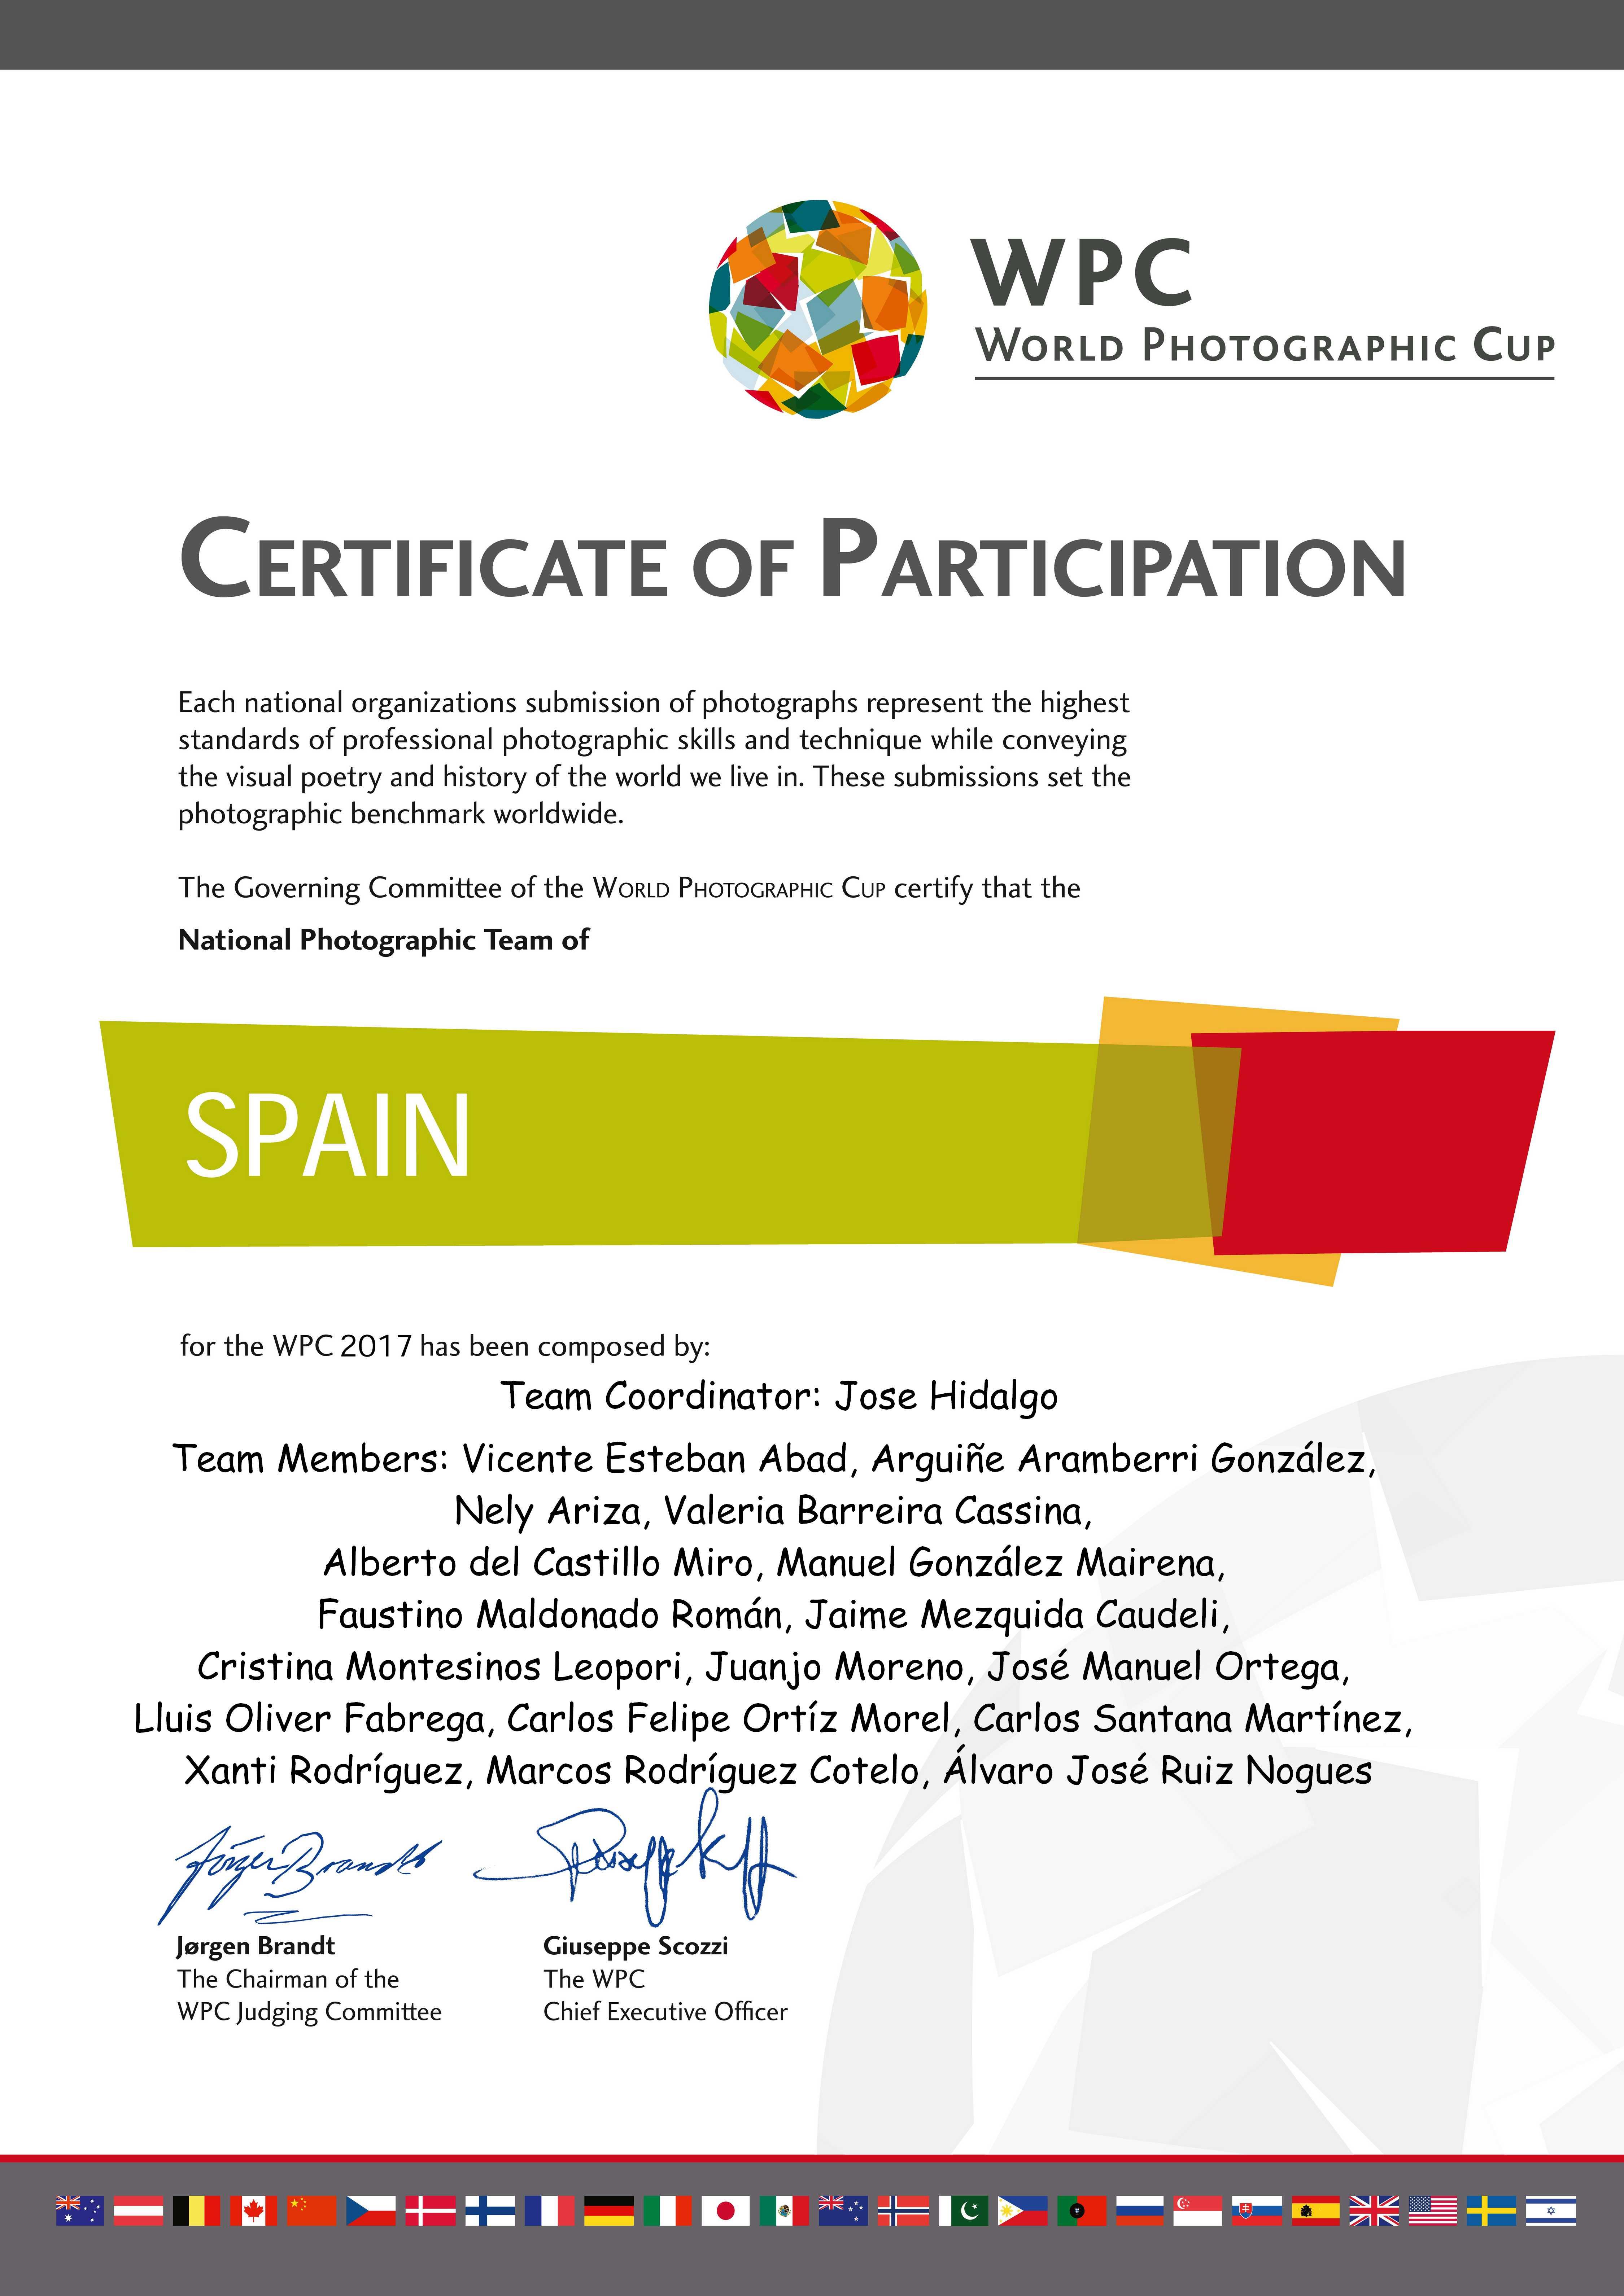 WPC certificate participation 2017 SPAIN » Fotografía de Autor, Noticias » José Manuel Ortega Fotógrafo